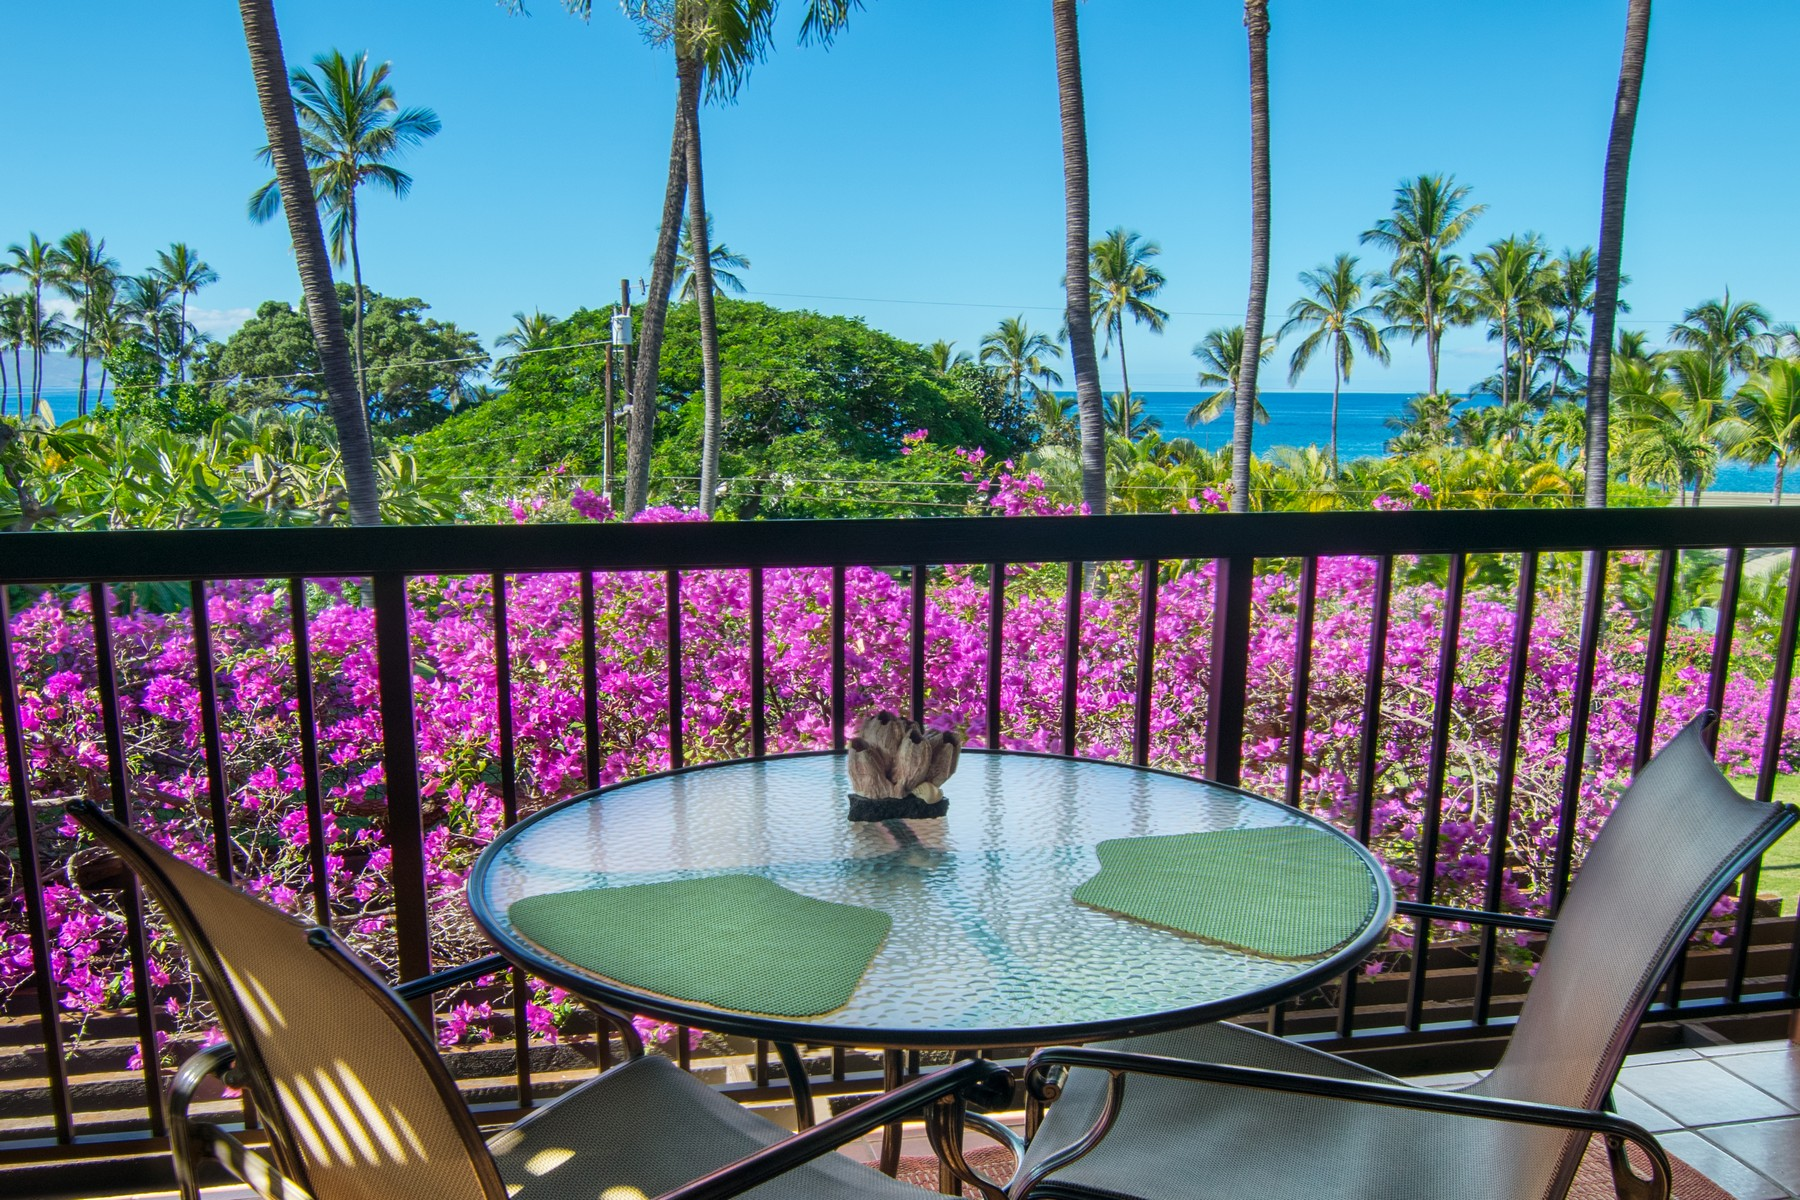 Apartamento para Venda às Just a Short Stroll to Keawekapu Beach 3300 Wailea Alanui Drive, Wailea Ekahi 21F Wailea, Havaí 96753 Estados Unidos